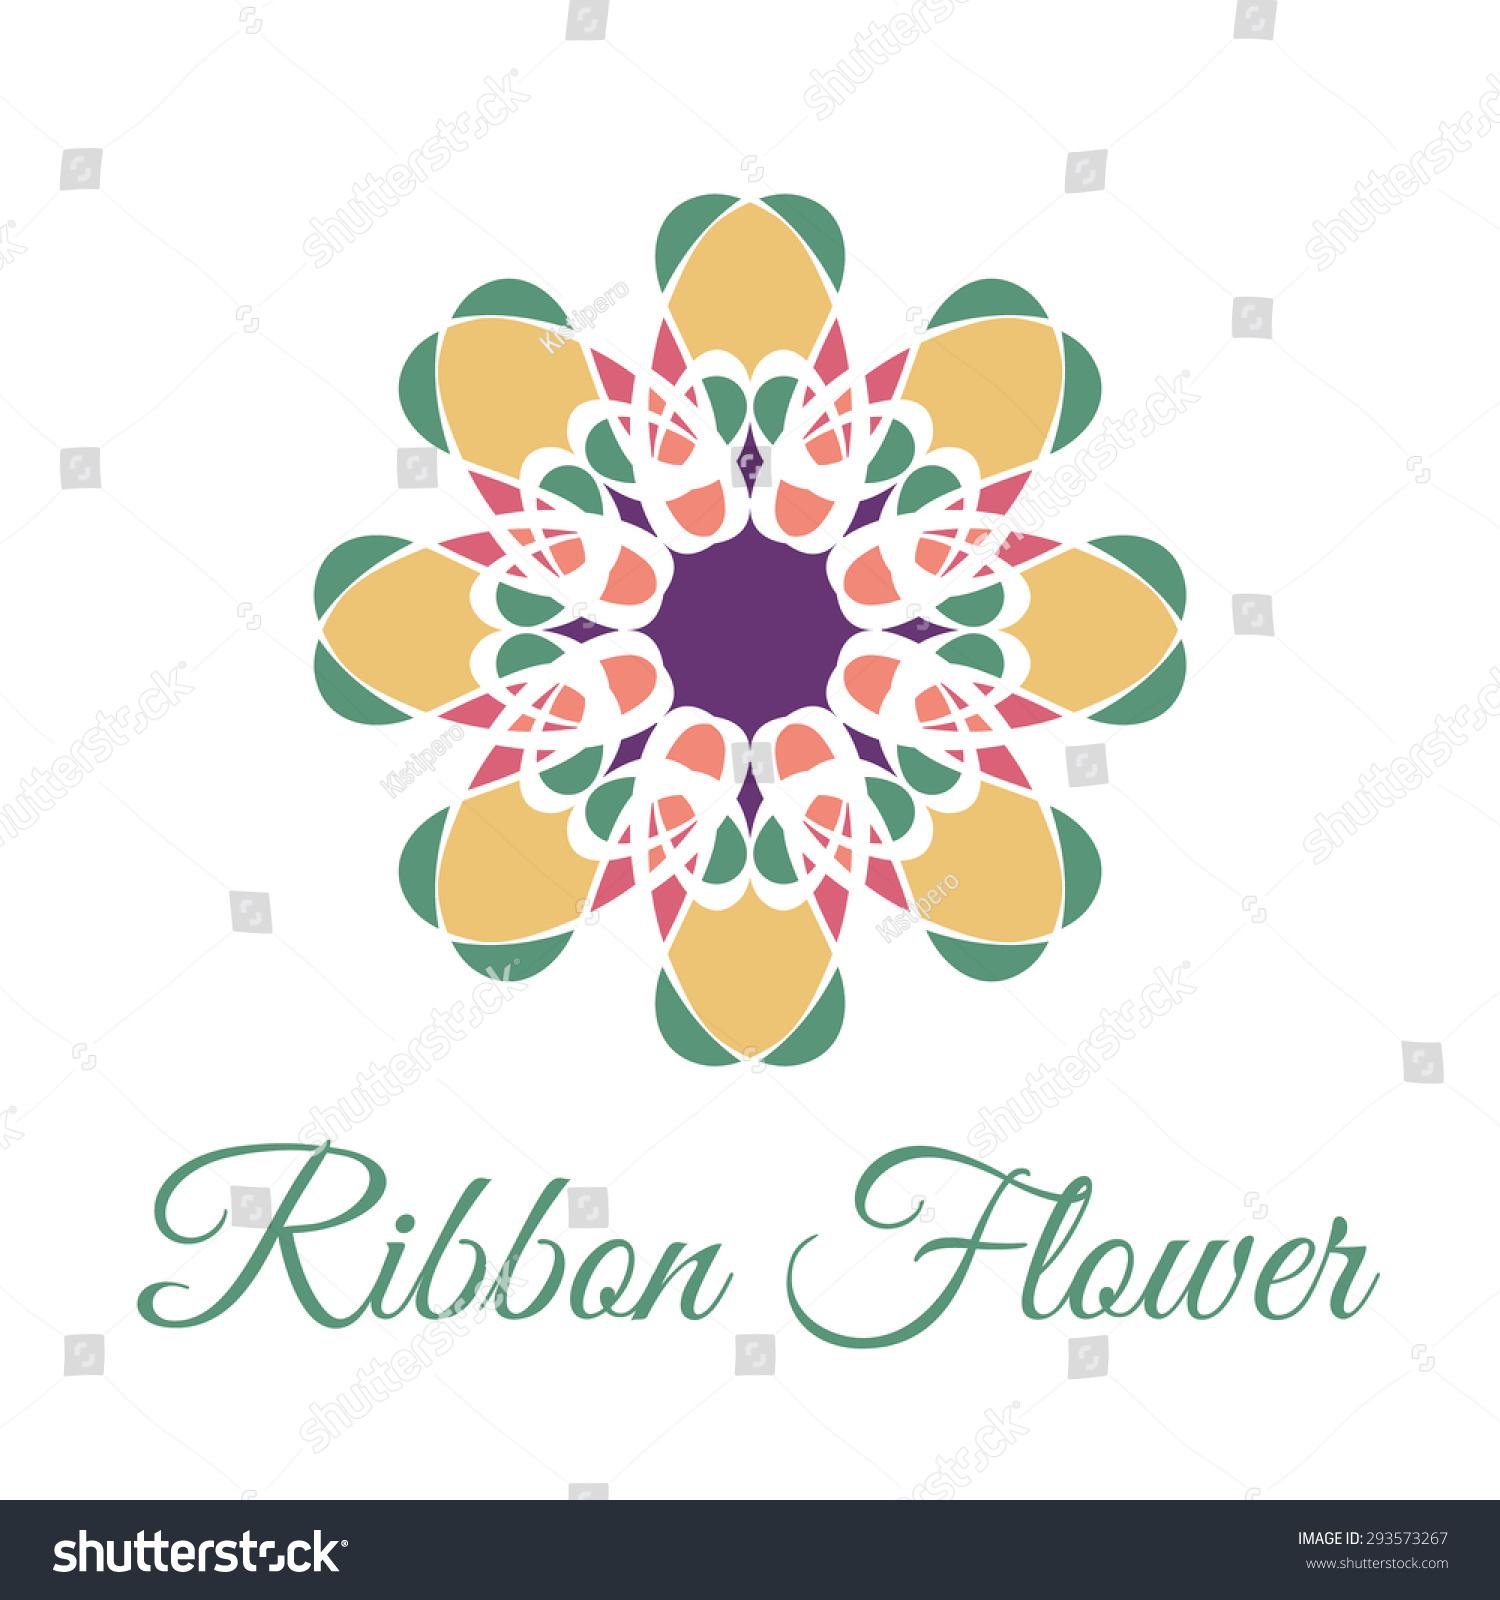 Vintage Ornamental Circular Flower Logo Colorful Stock Vector